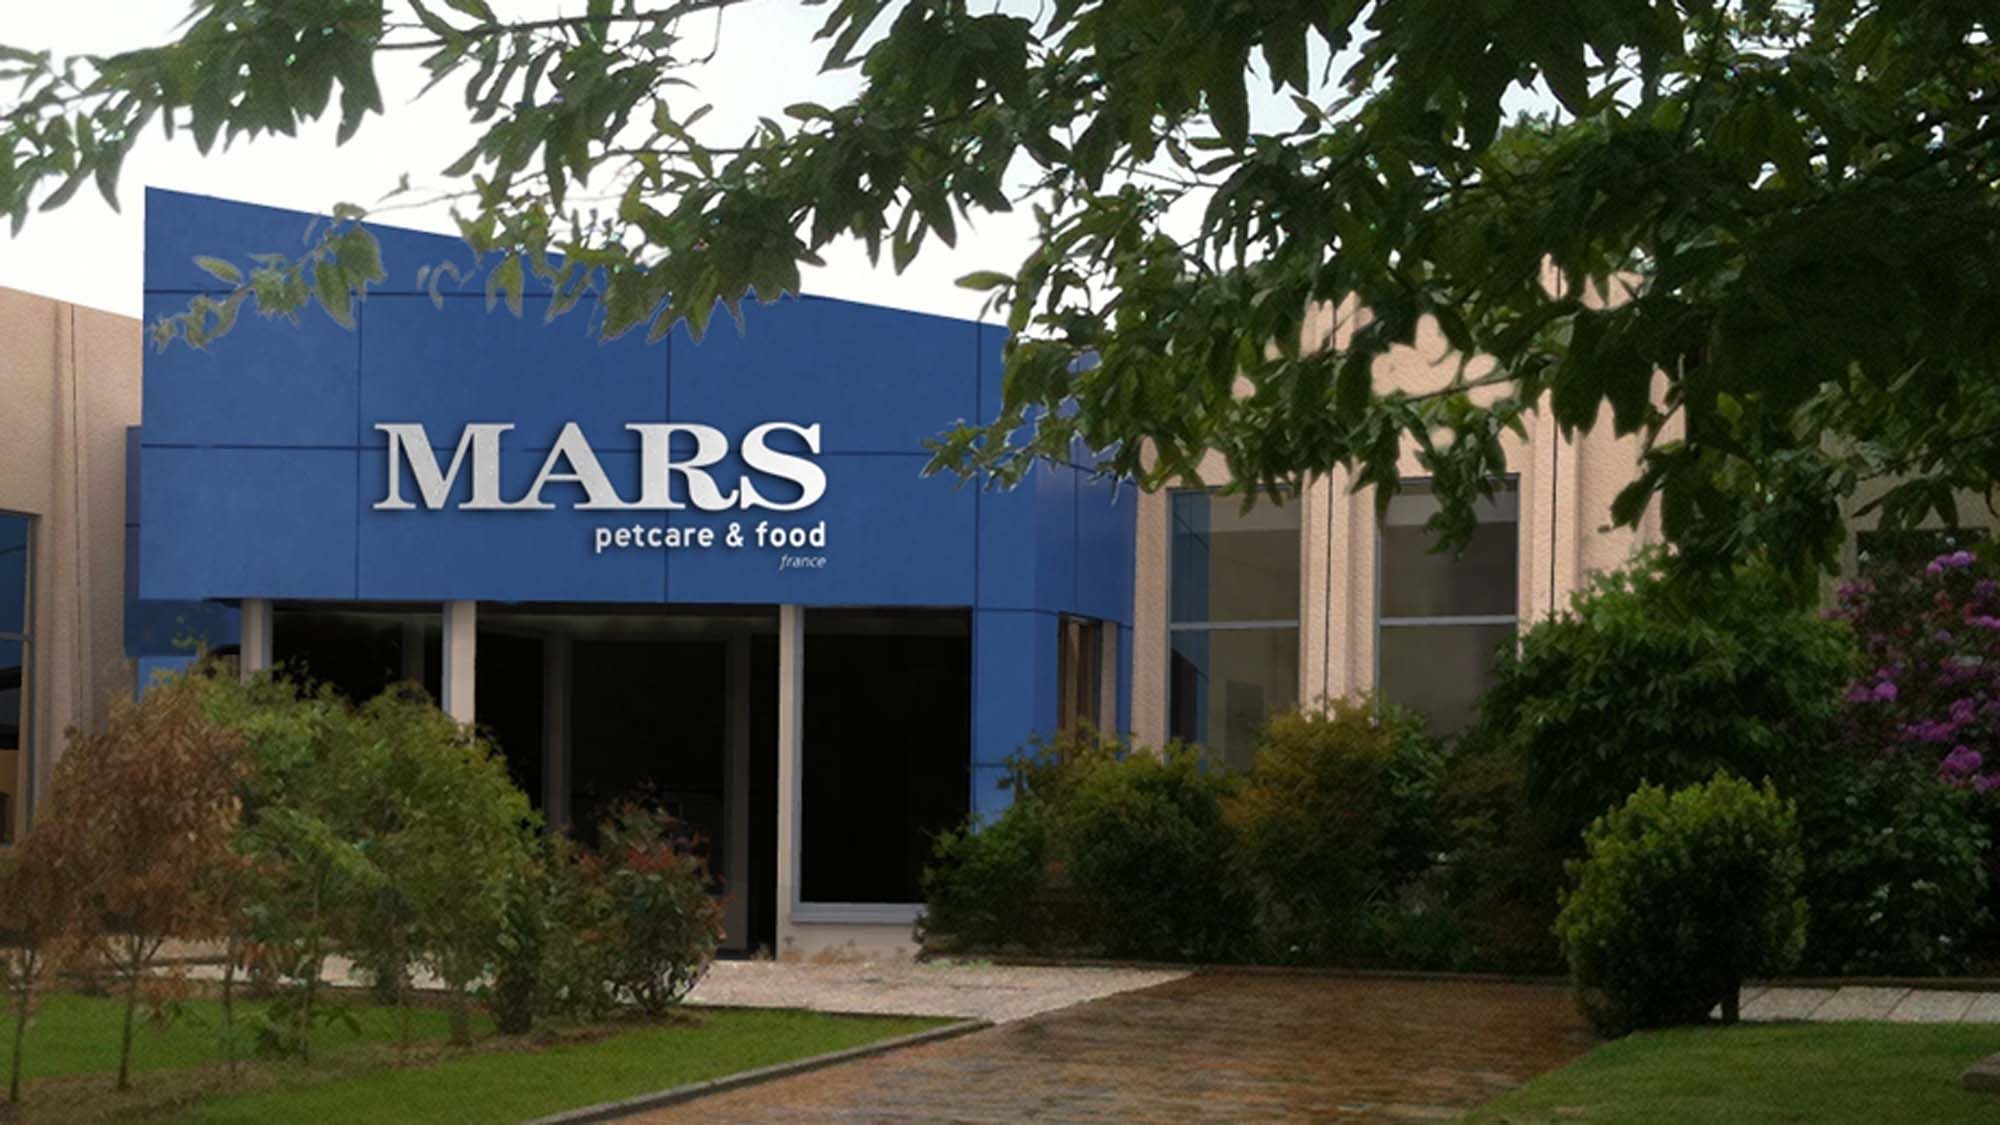 Mars Petcare & Food